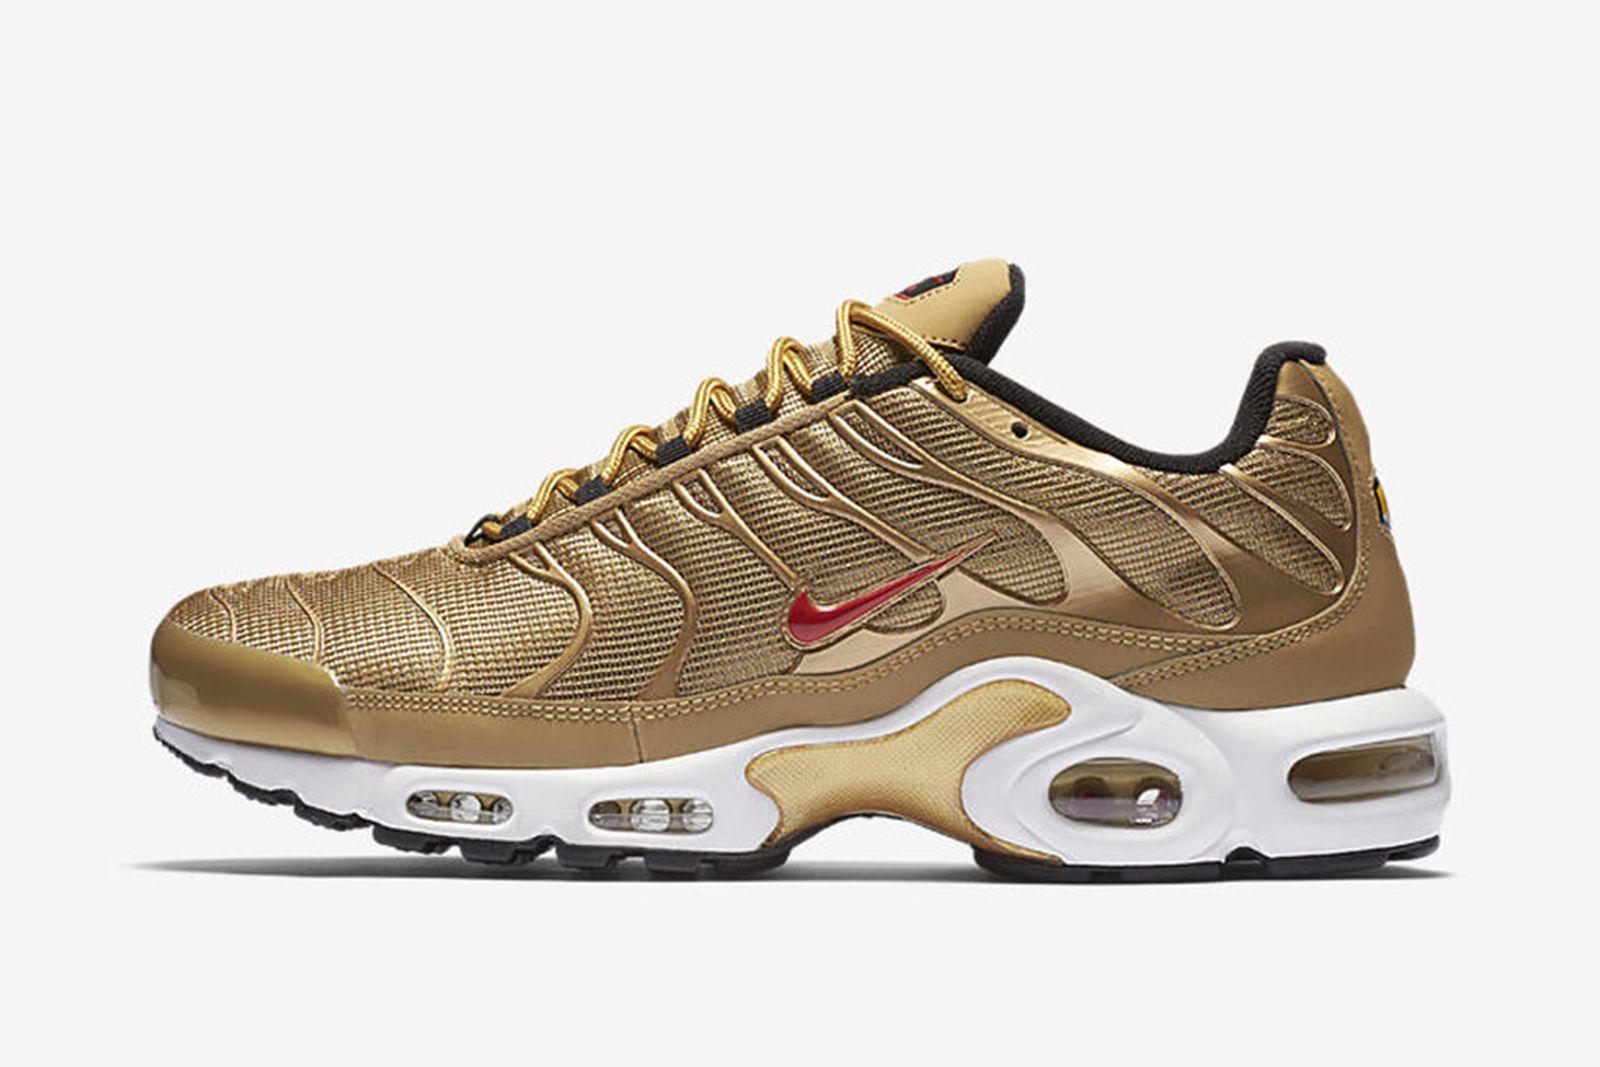 nike-air-vapormax-97-metallic-gold-release-price-07